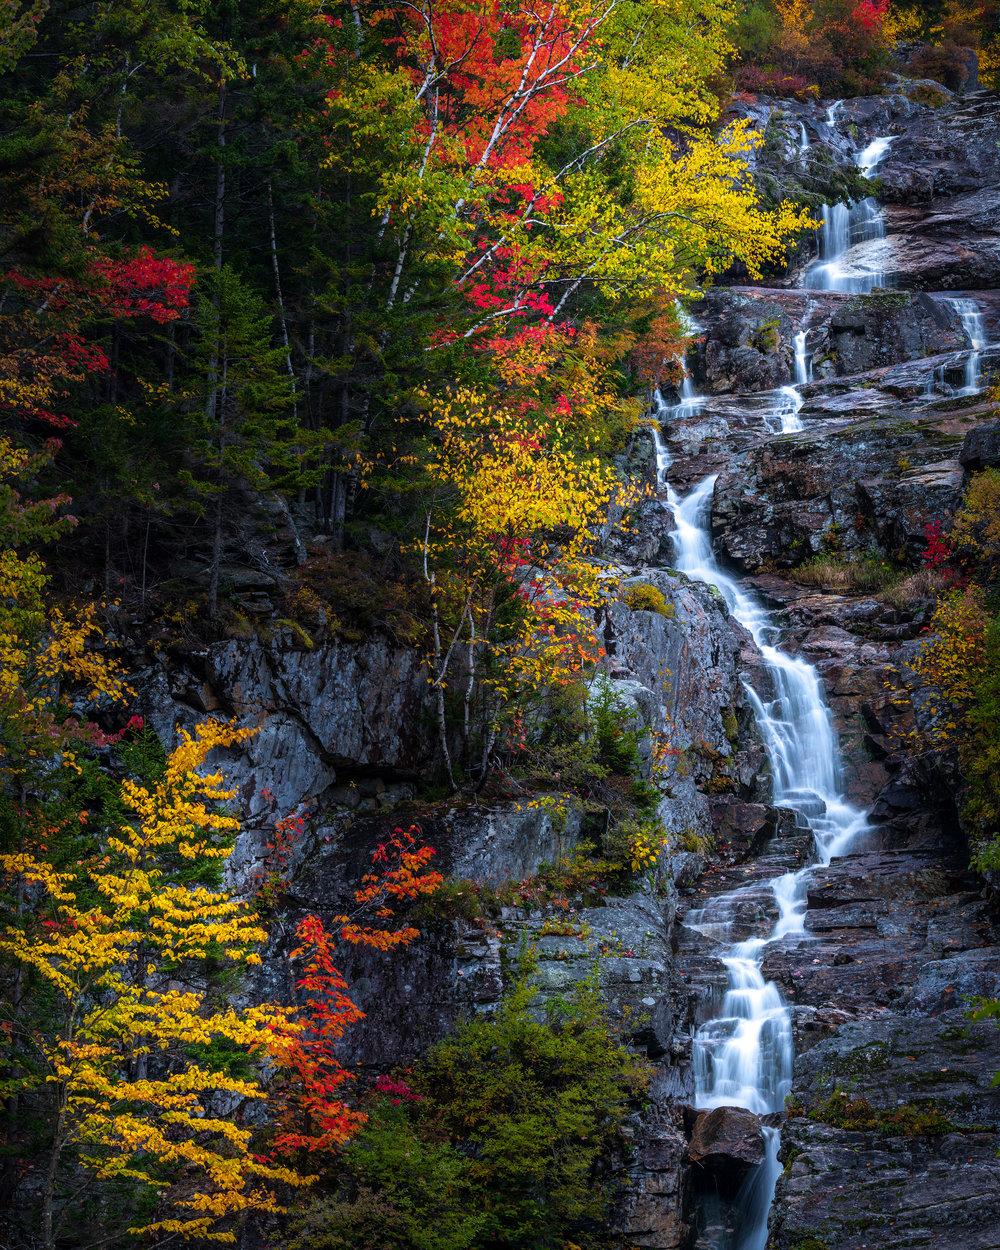 Fall foliage at Silver Cascade